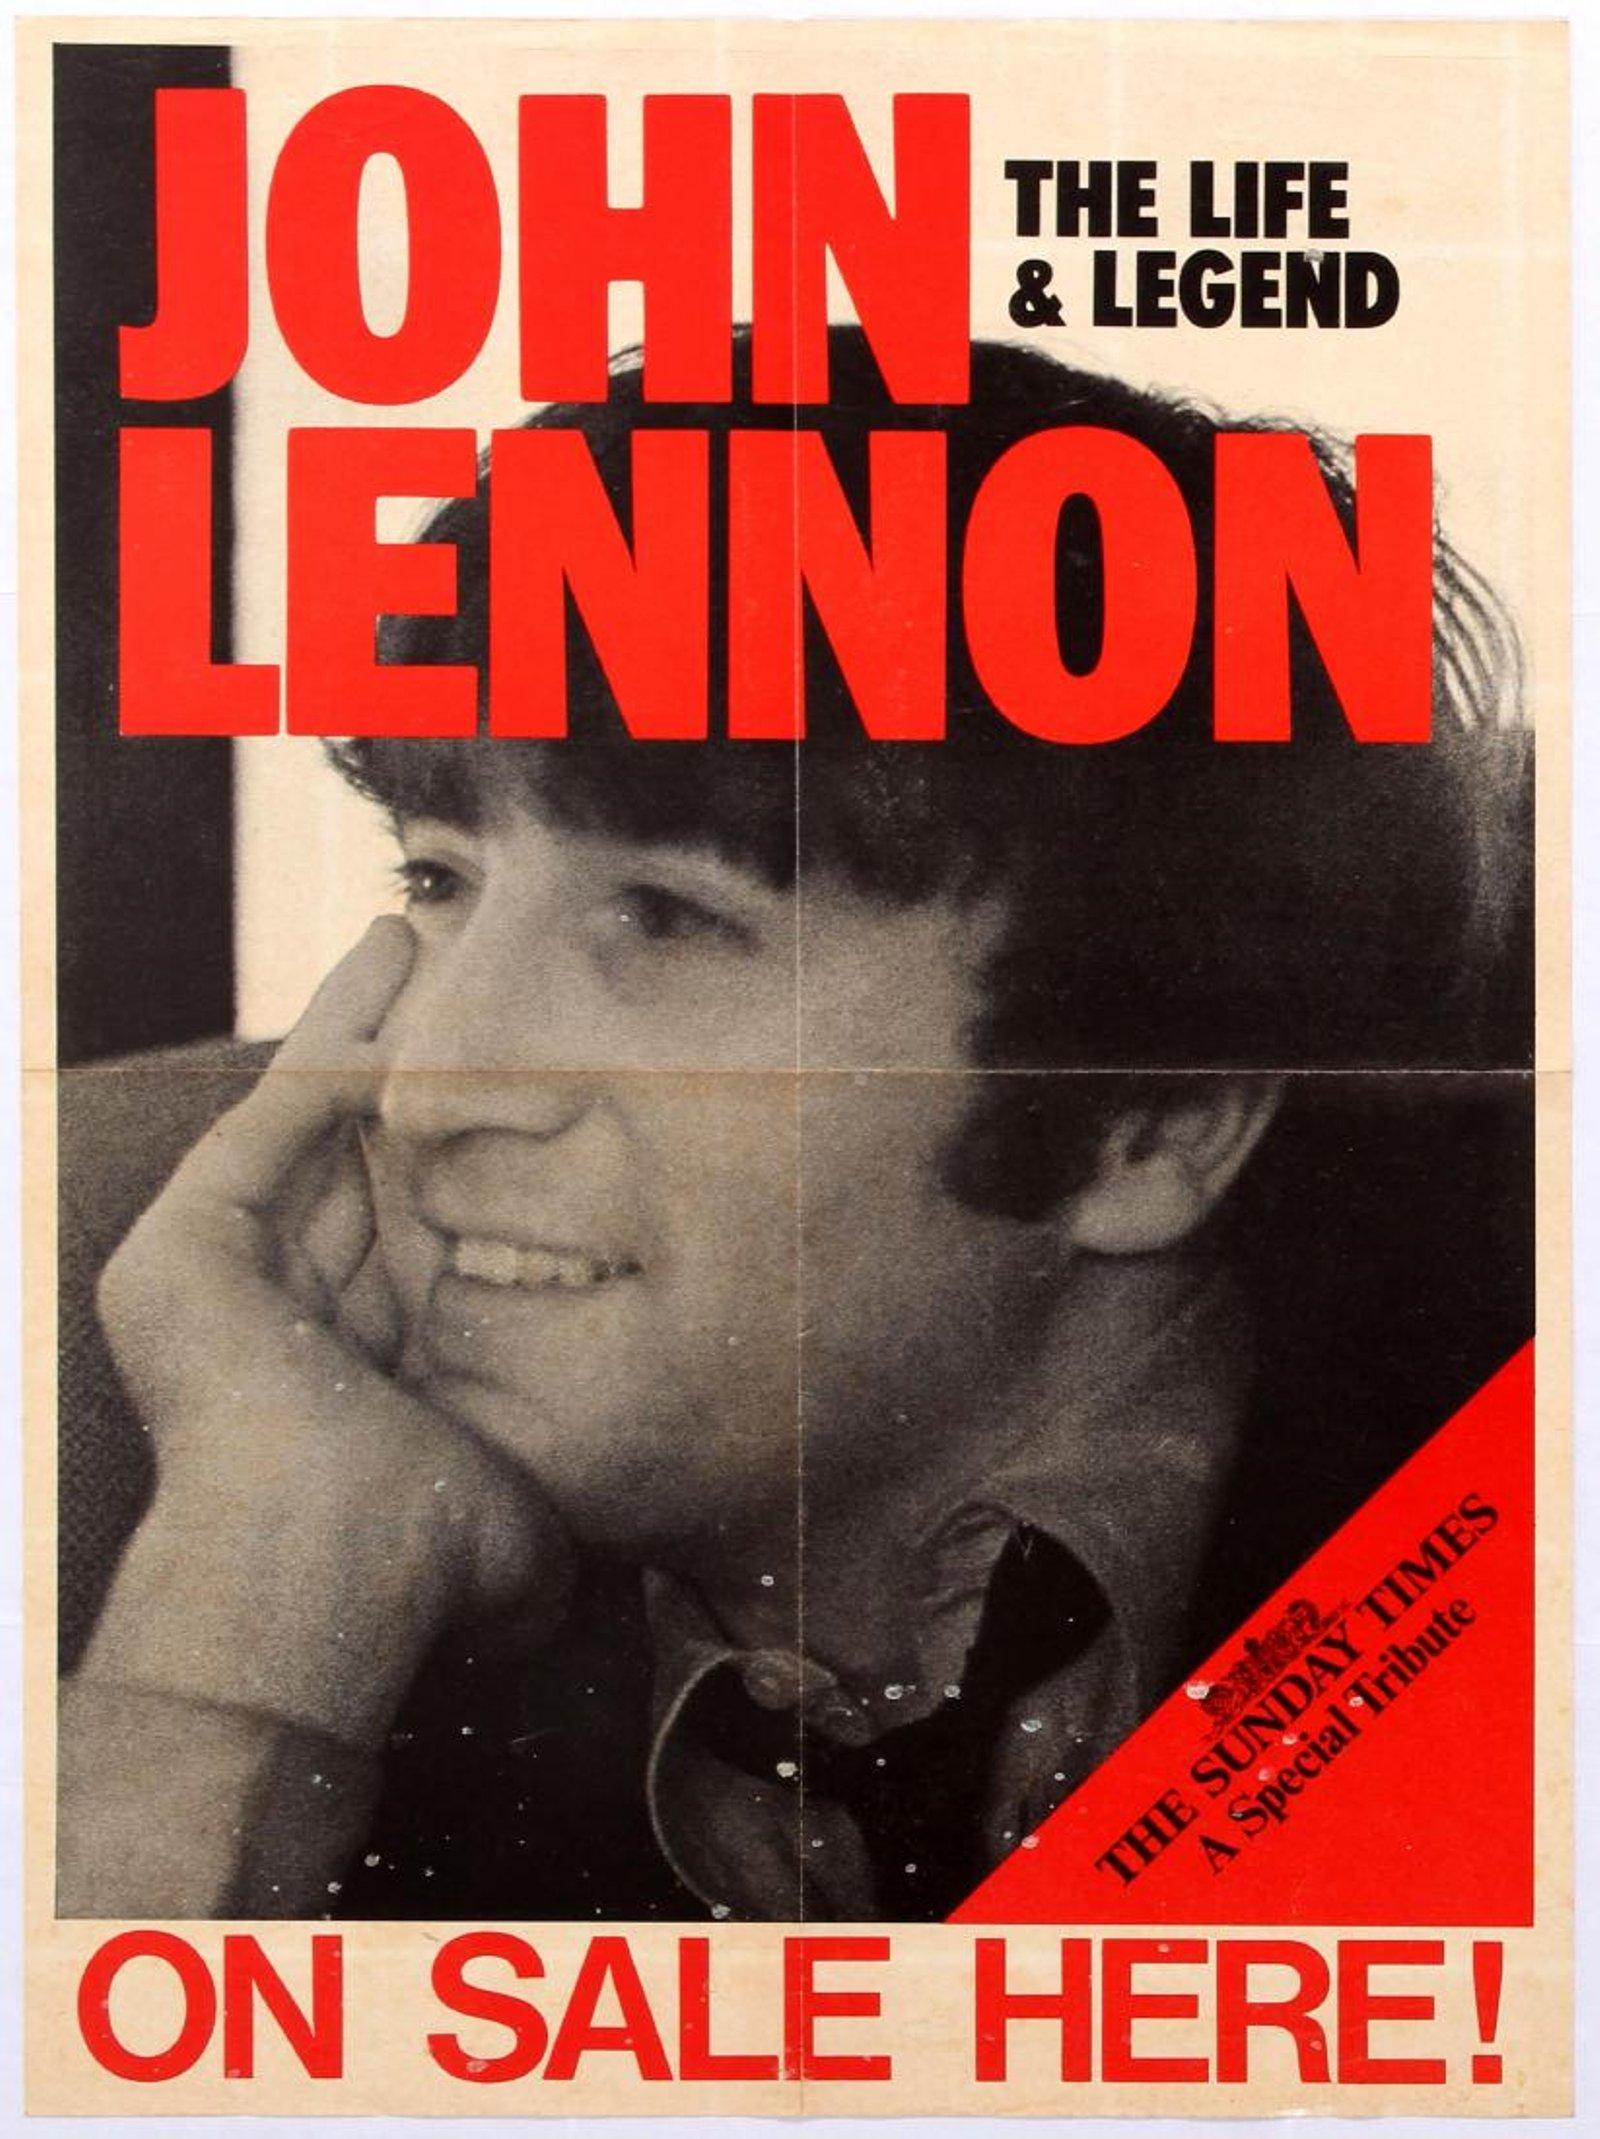 Sunday Times John Lennon Beatles